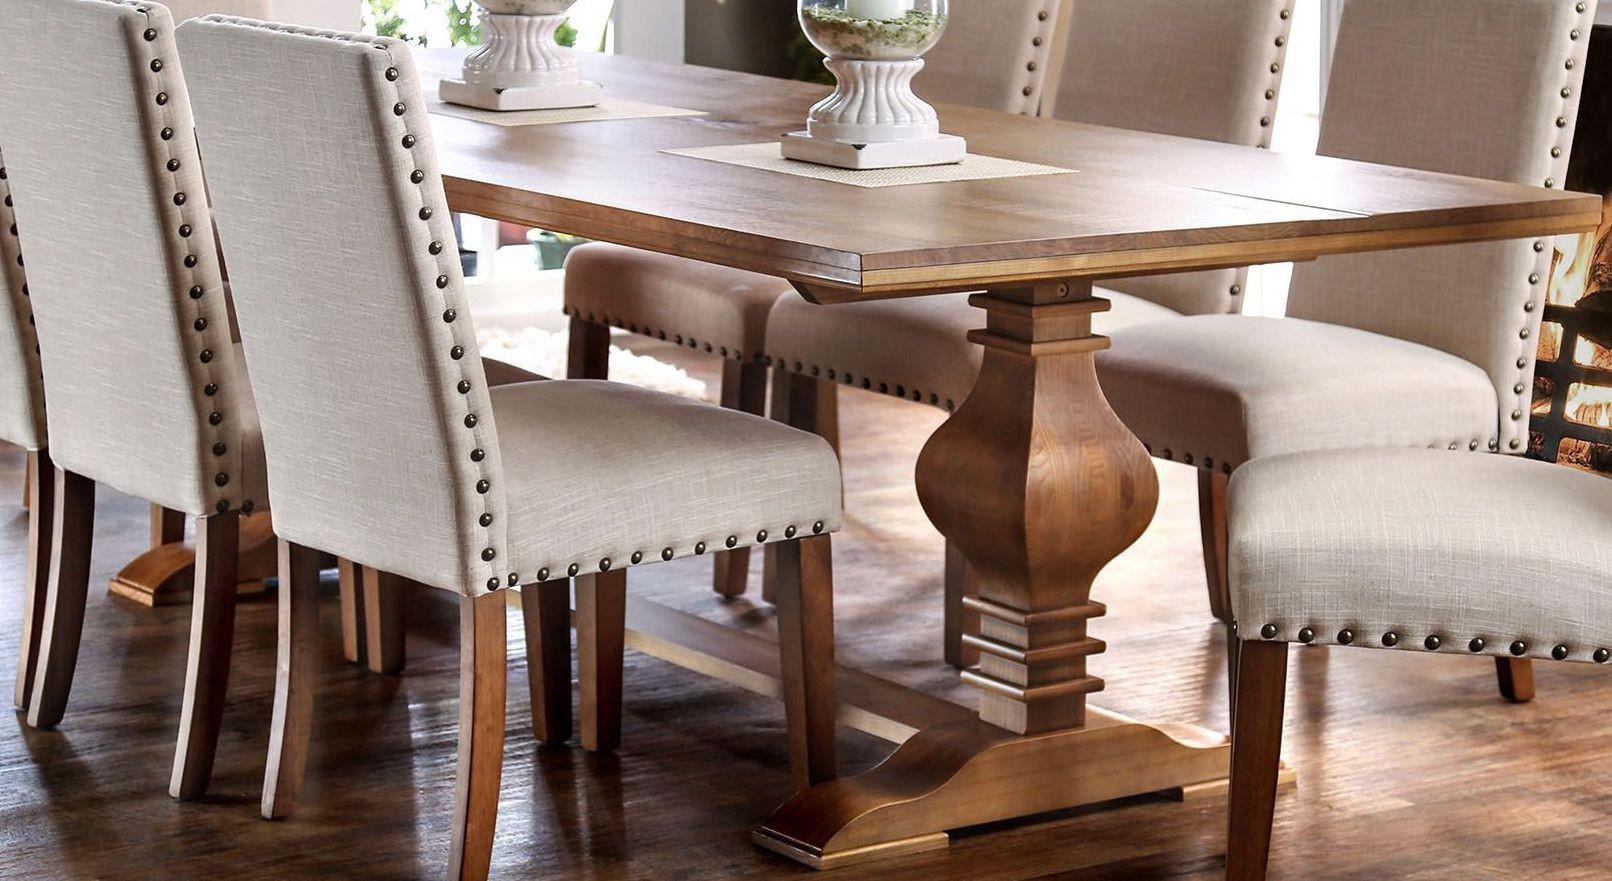 Macapa oak rectangular dining table cm3441t table furniture of america - Rectangular dining table for 6 ...